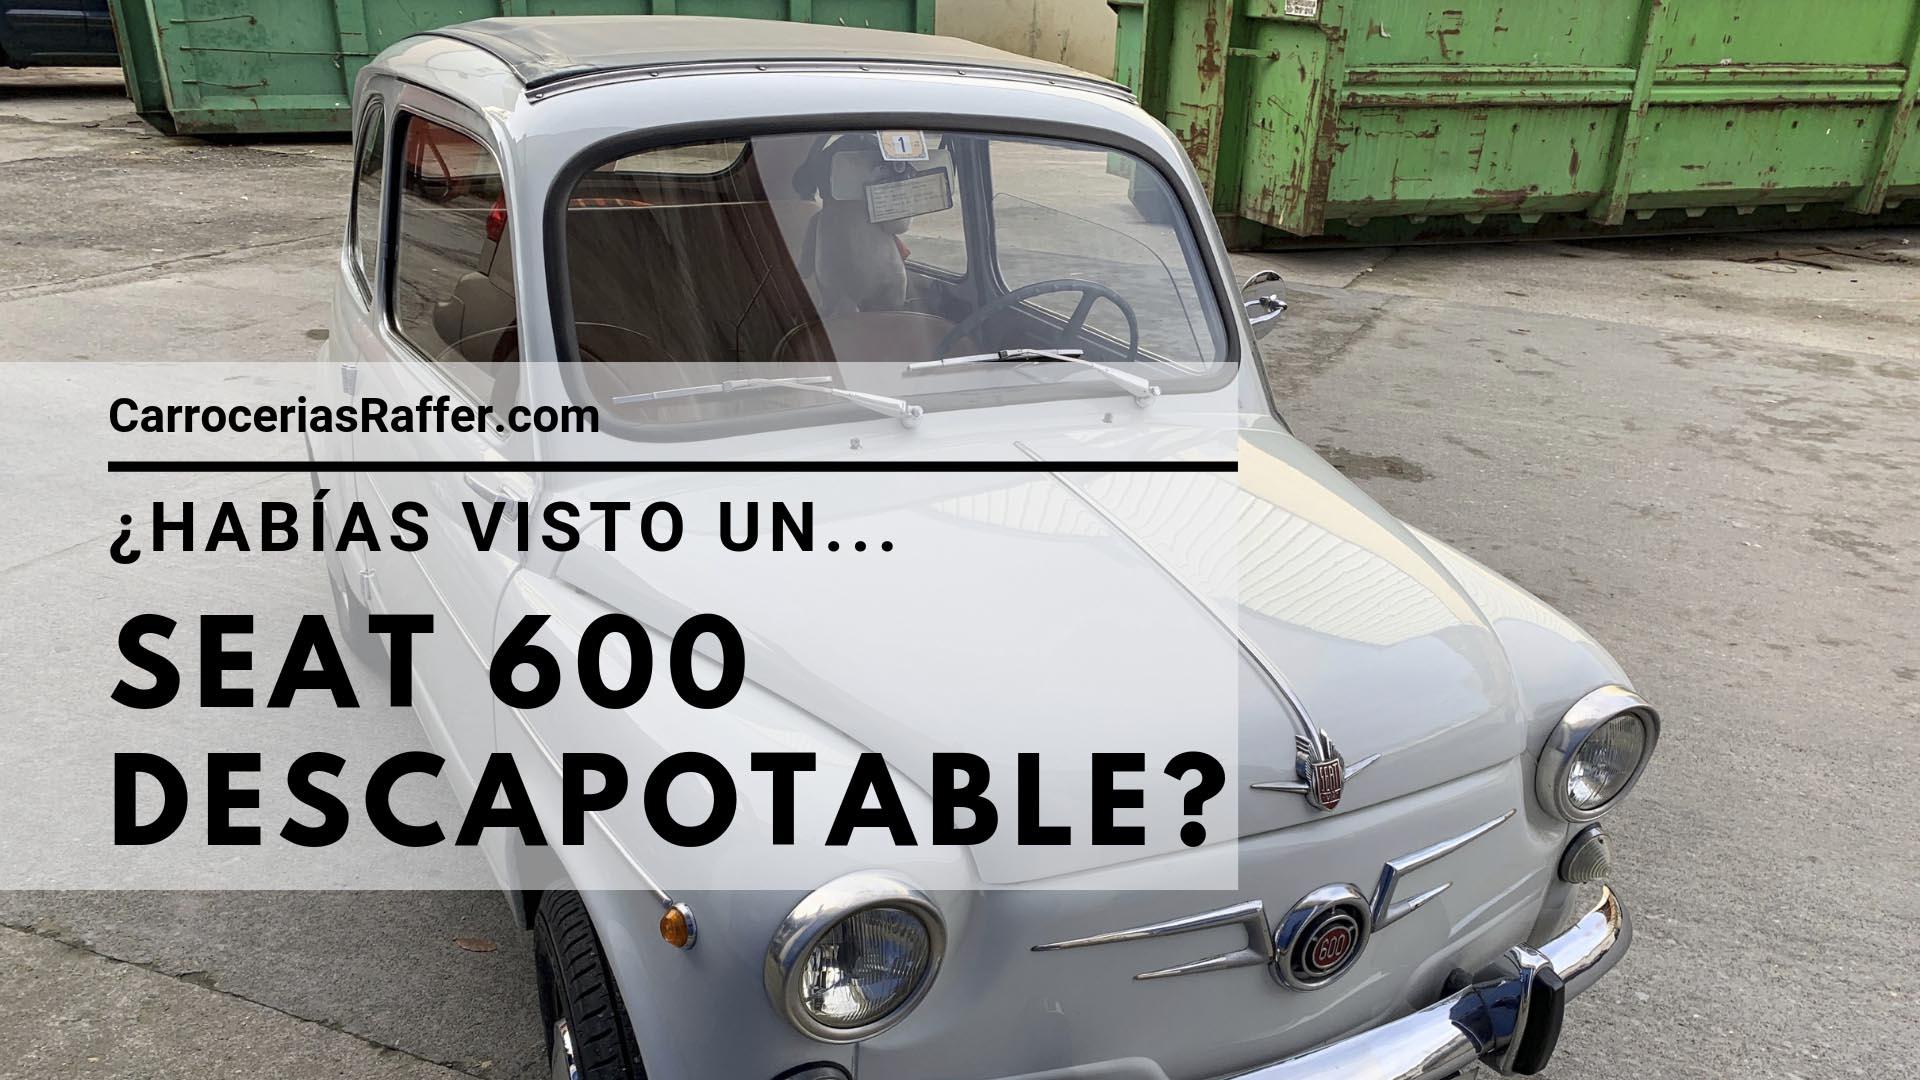 0 seat 600 descapotable carrocerias raffer hernani donostia